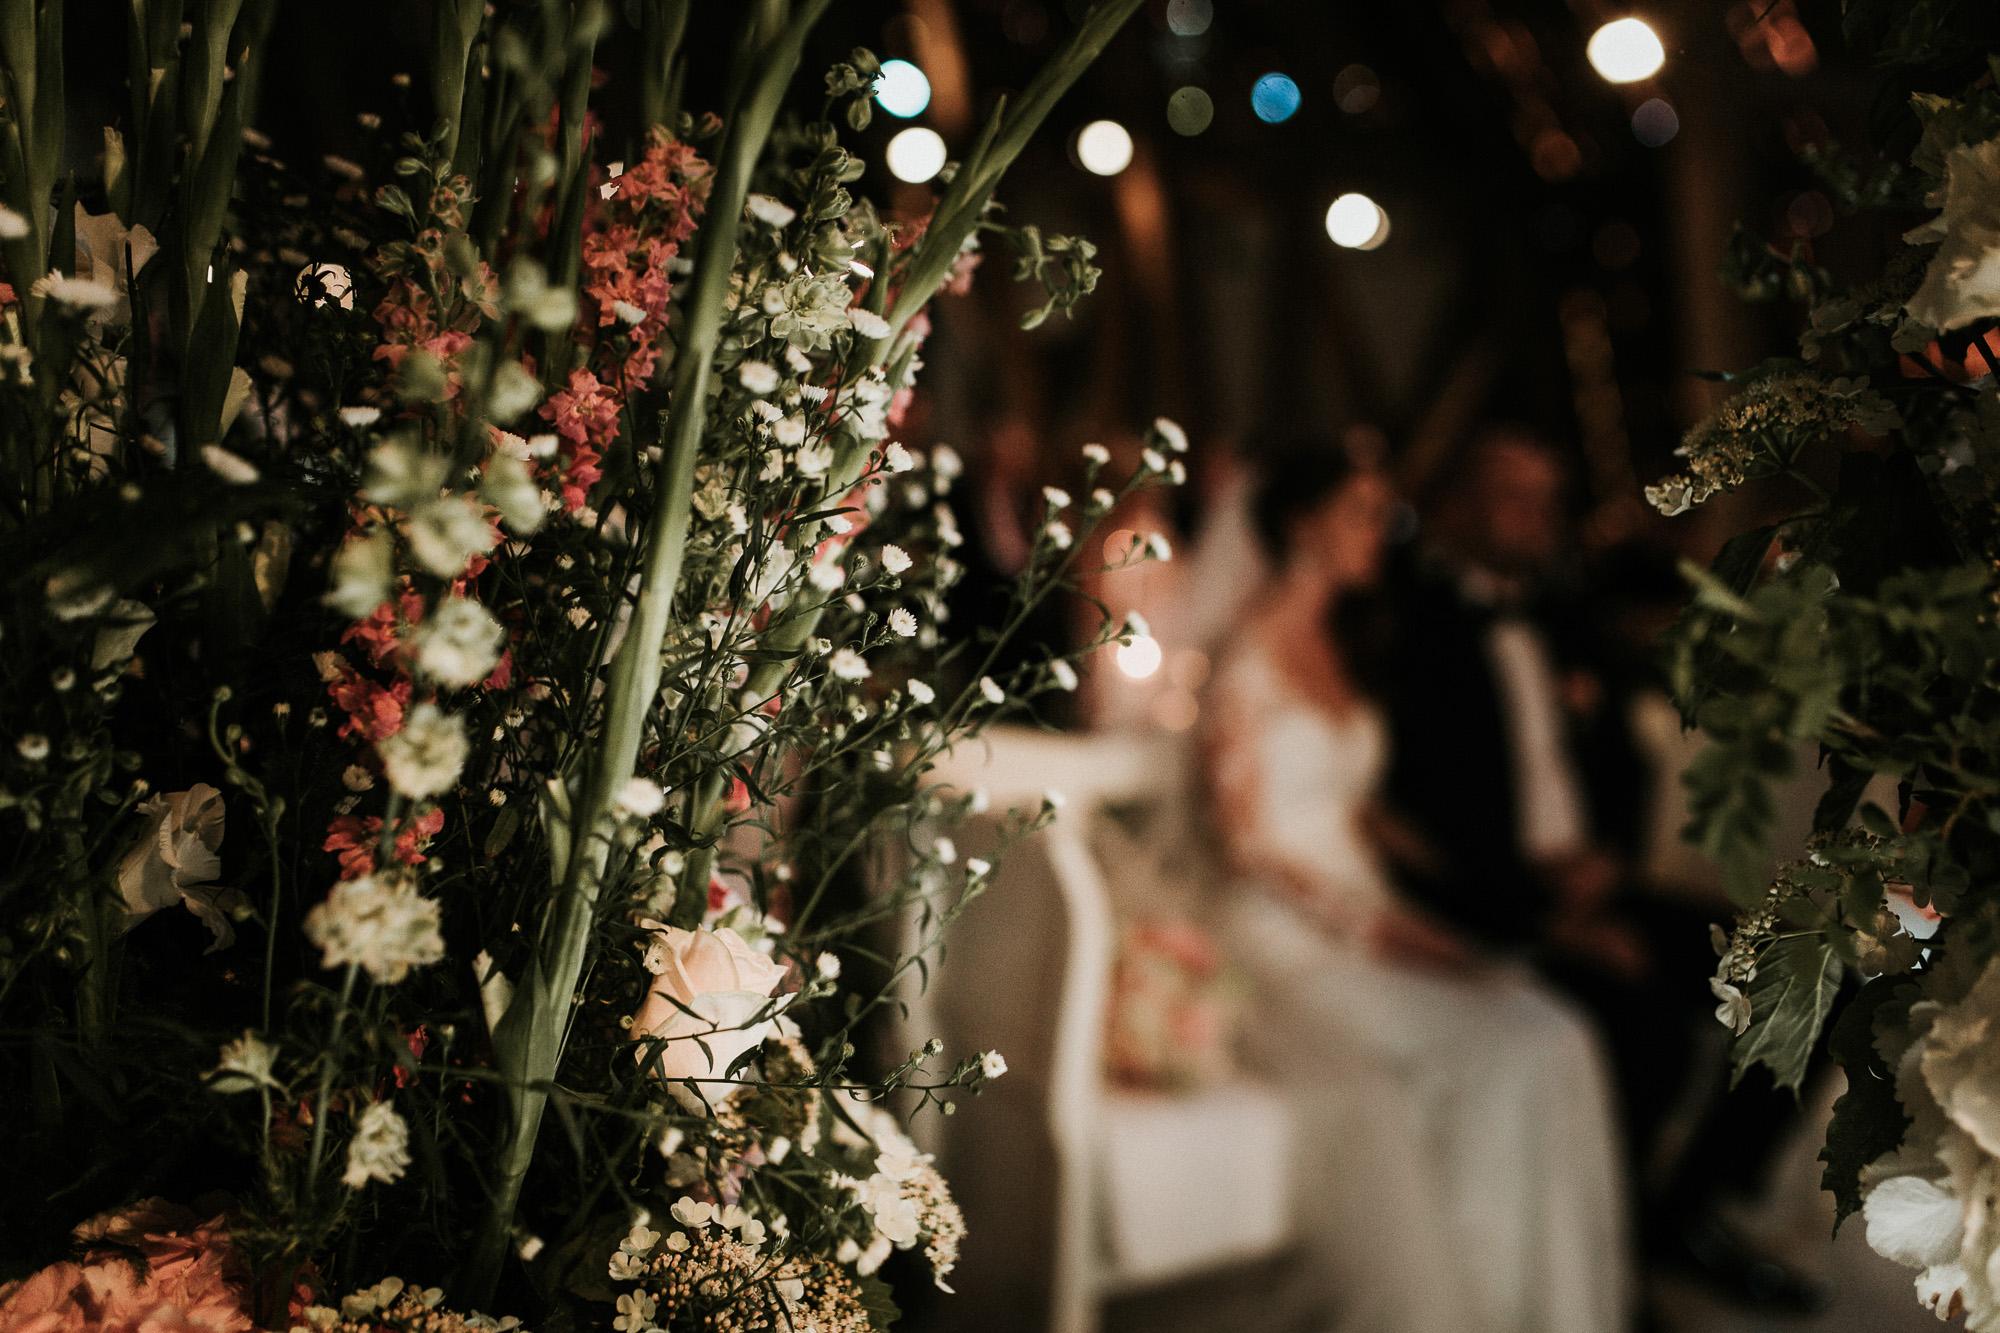 DanielaMarquardtPhotography_Hochzeitsfotograf_Düsseldorf_Köln_Mallorca_Bayern_Austria_Harz_Wedding_AileenundLennart_Weddingphotographer_Ibiza_Tuskany_Italien_Toskana_Portugal_Lissabon141